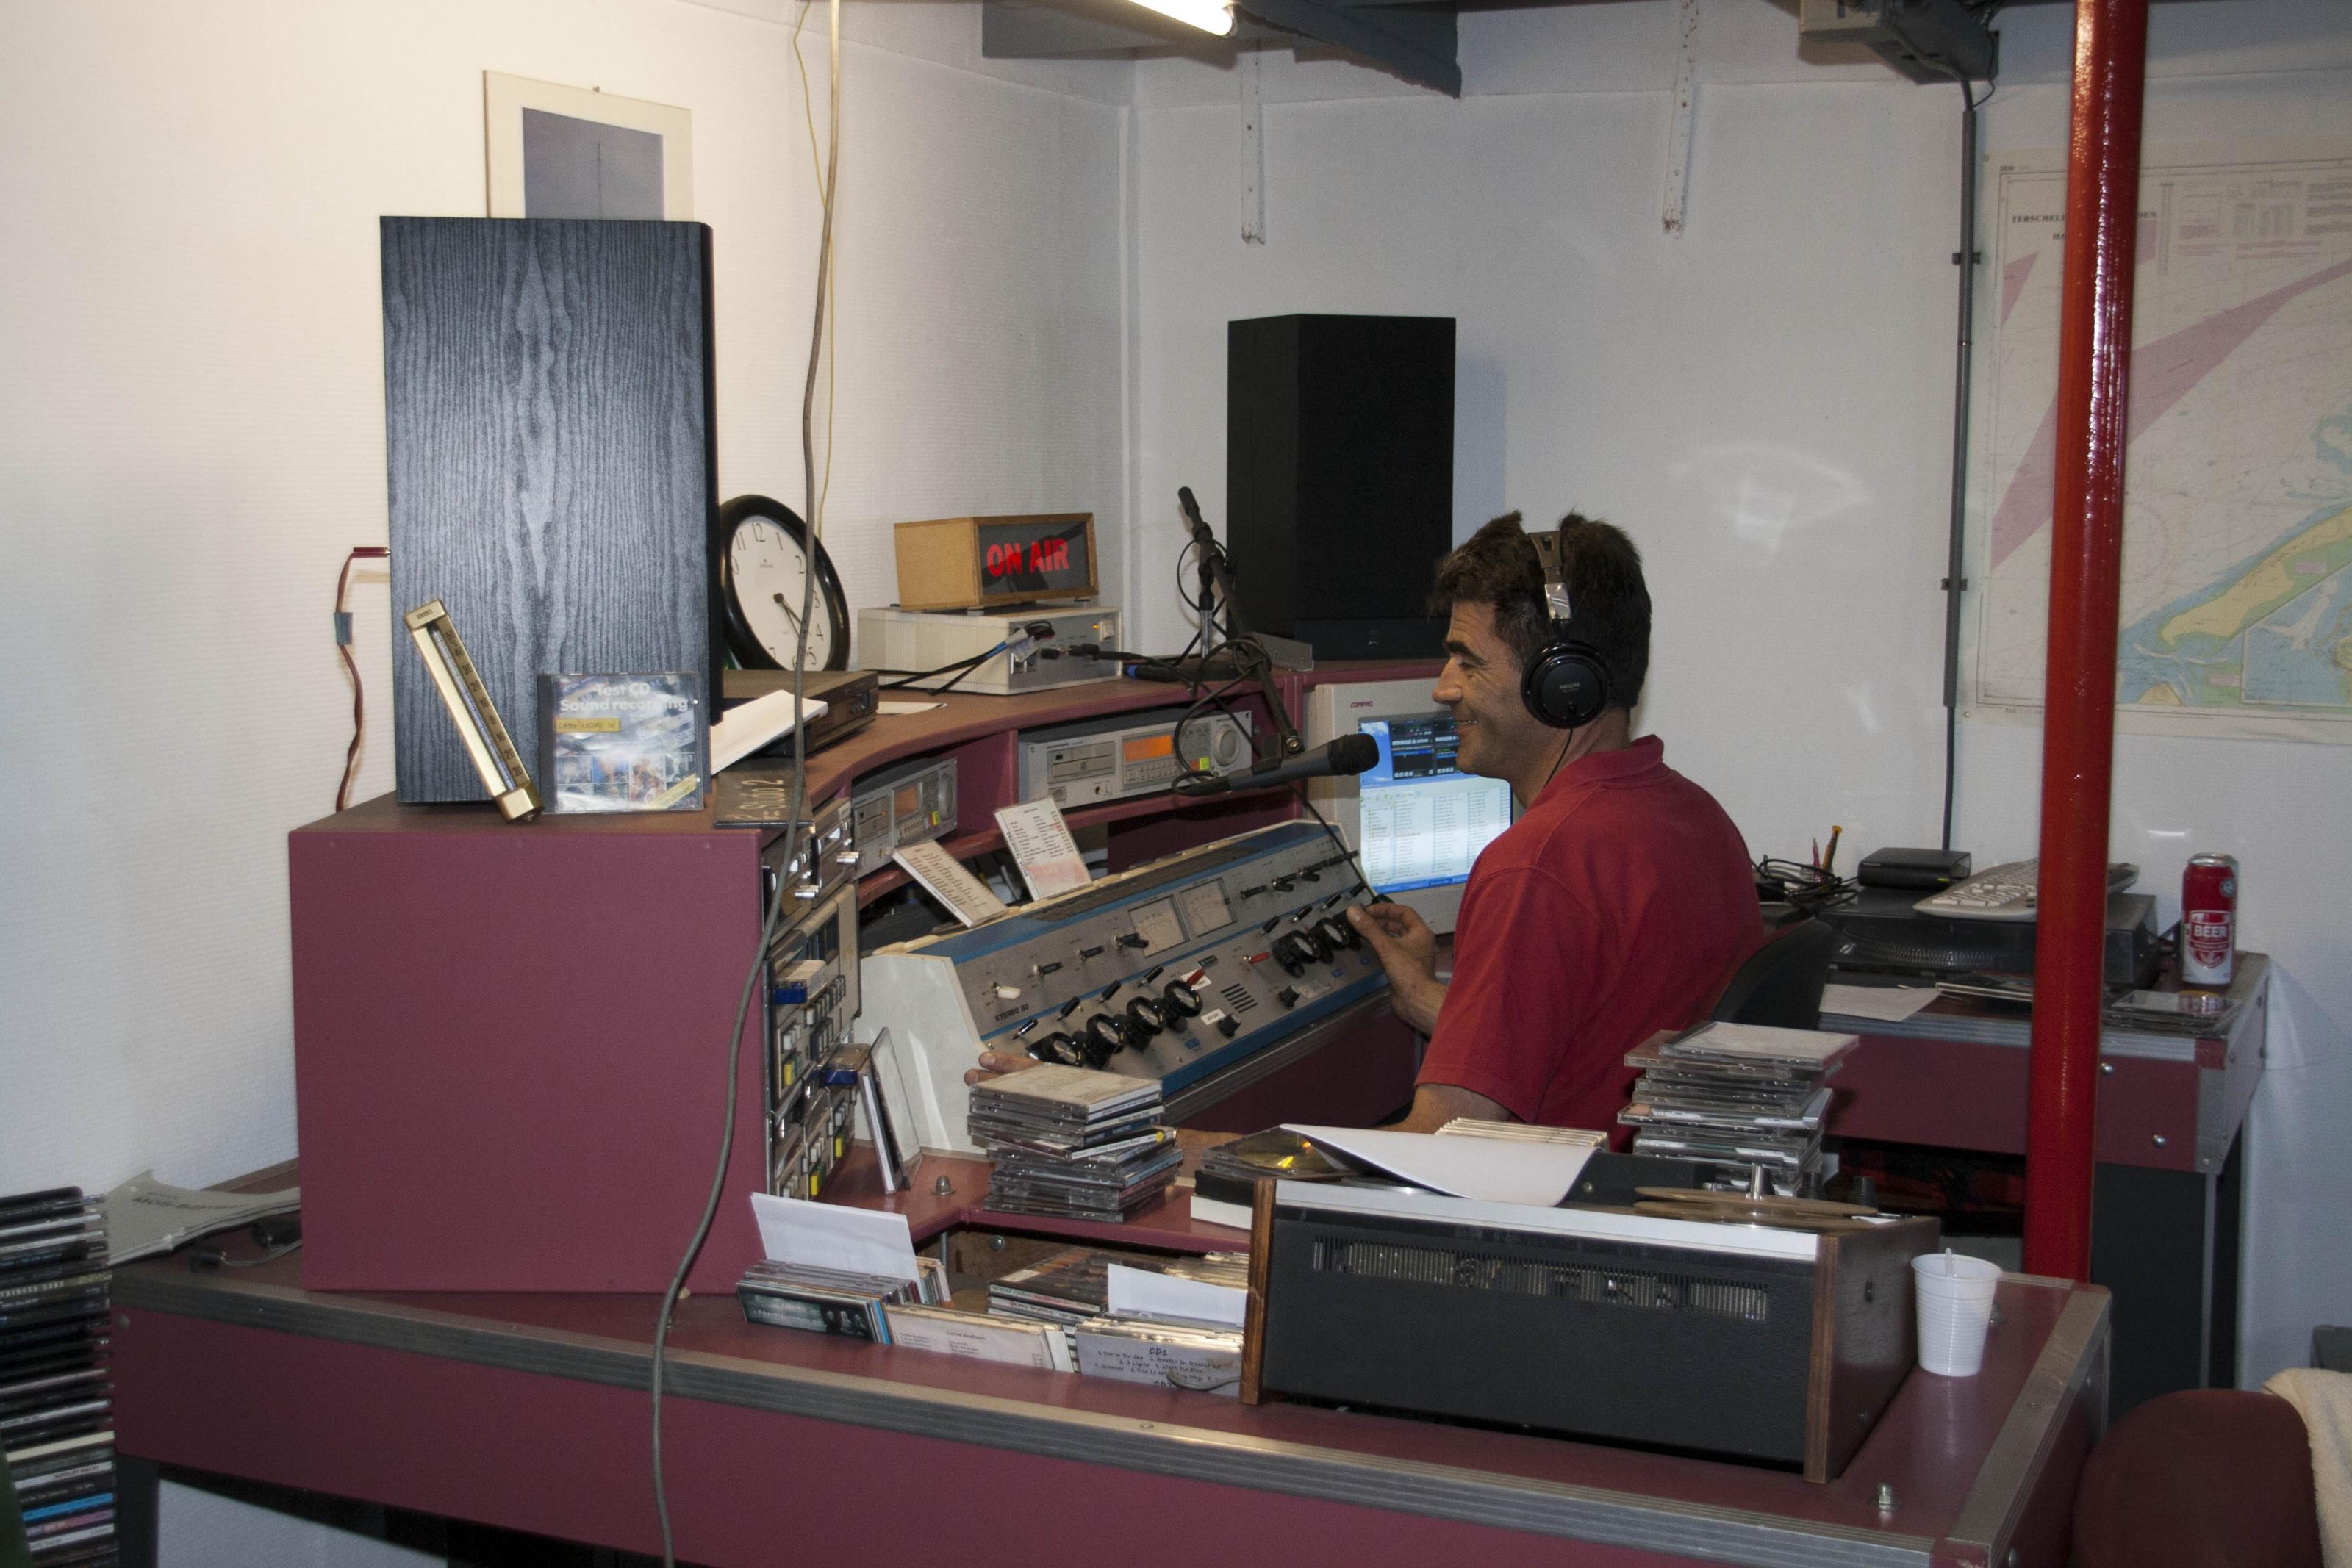 2011-06-02-RadioWaddenzee-184.jpg